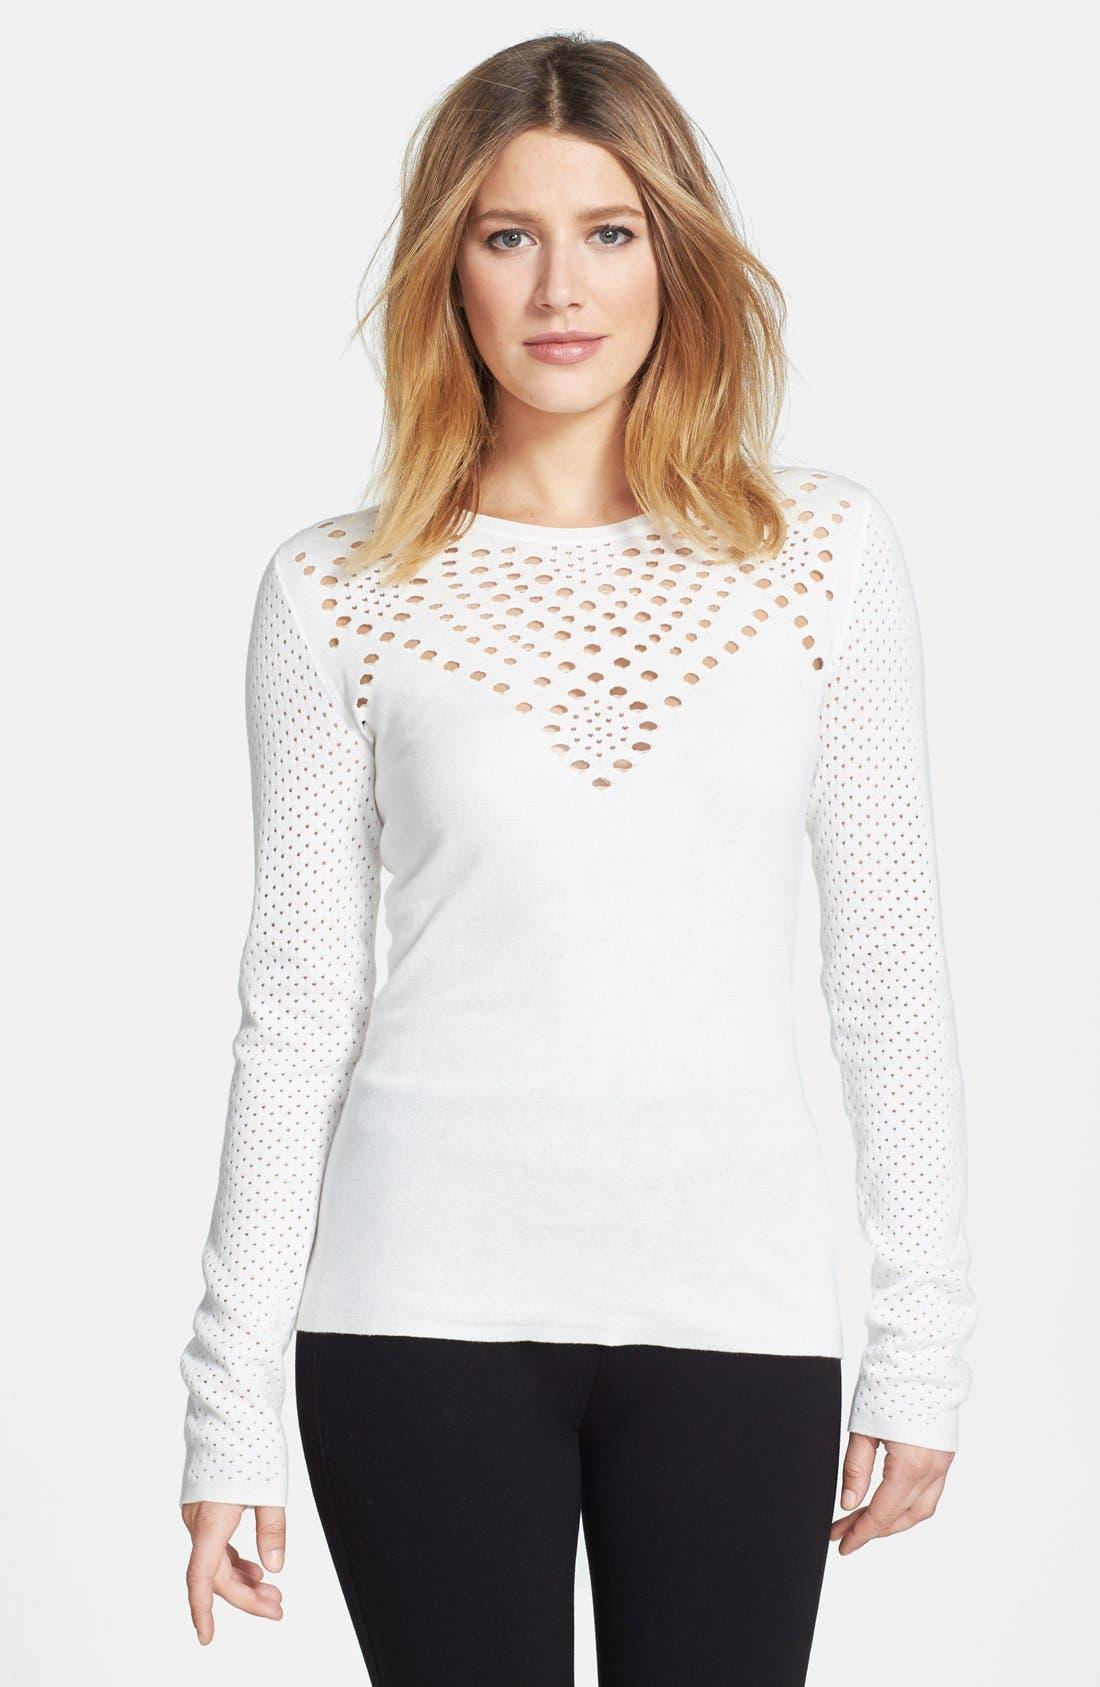 Alternate Image 1 Selected - Rachel Roy Cotton Knit Top